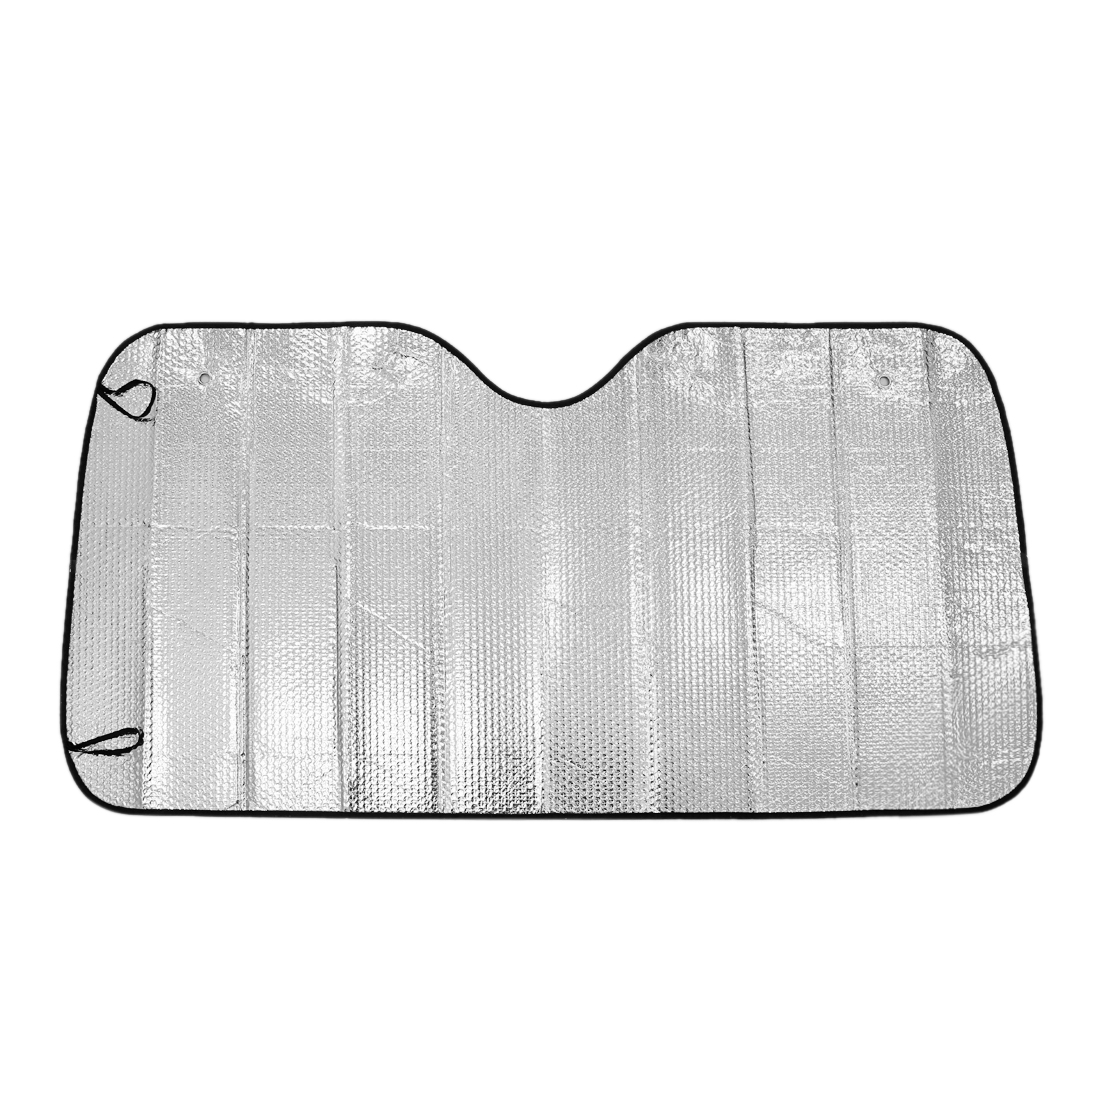 Car Front Rear Windscreen Foldable Windshield Sunshade Shield 140cm x 70cm